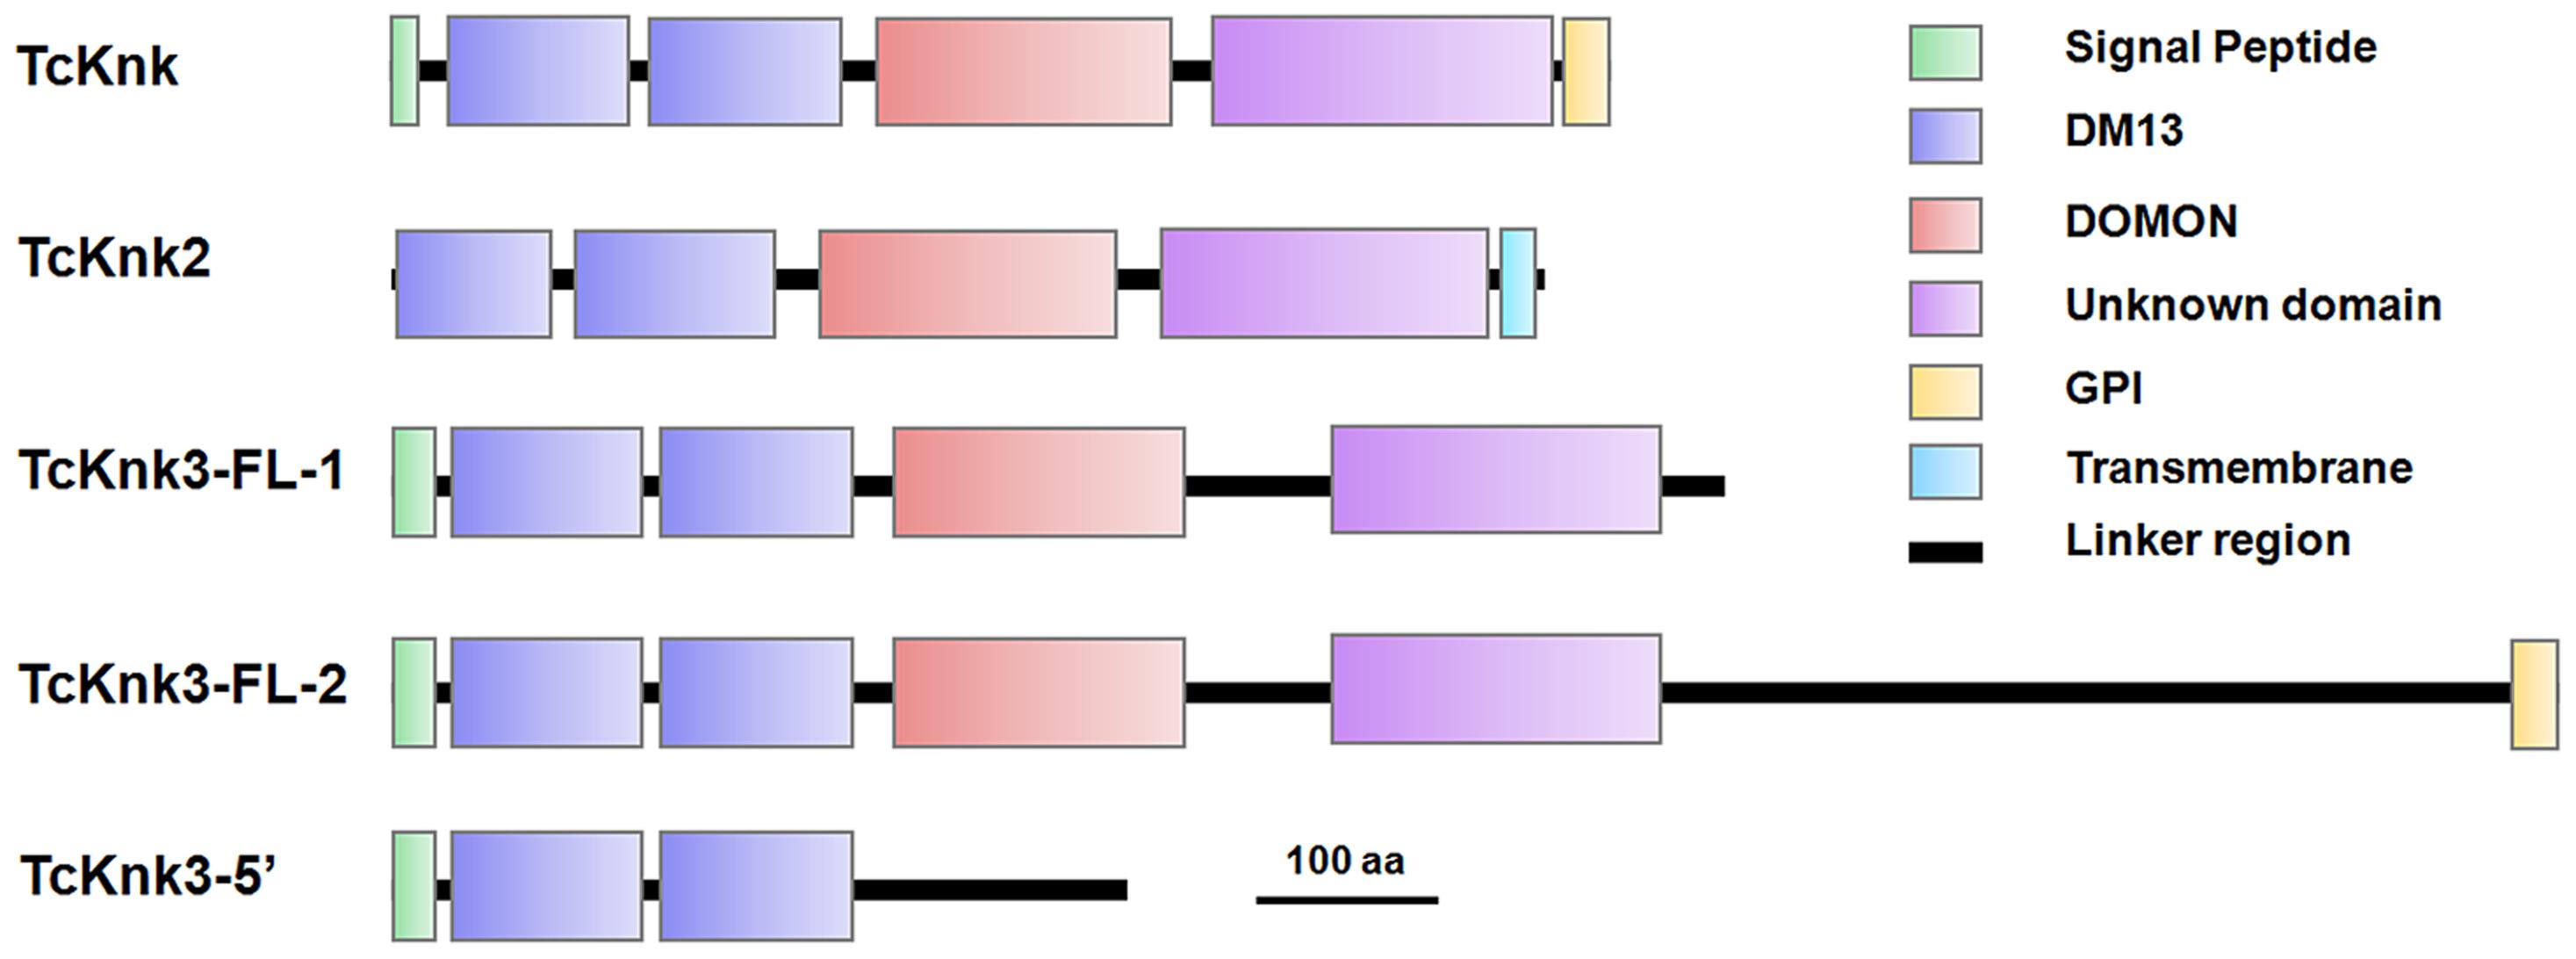 Domain architecture of putative TcKnk-family proteins from <i>Tribolium castaneum</i>.